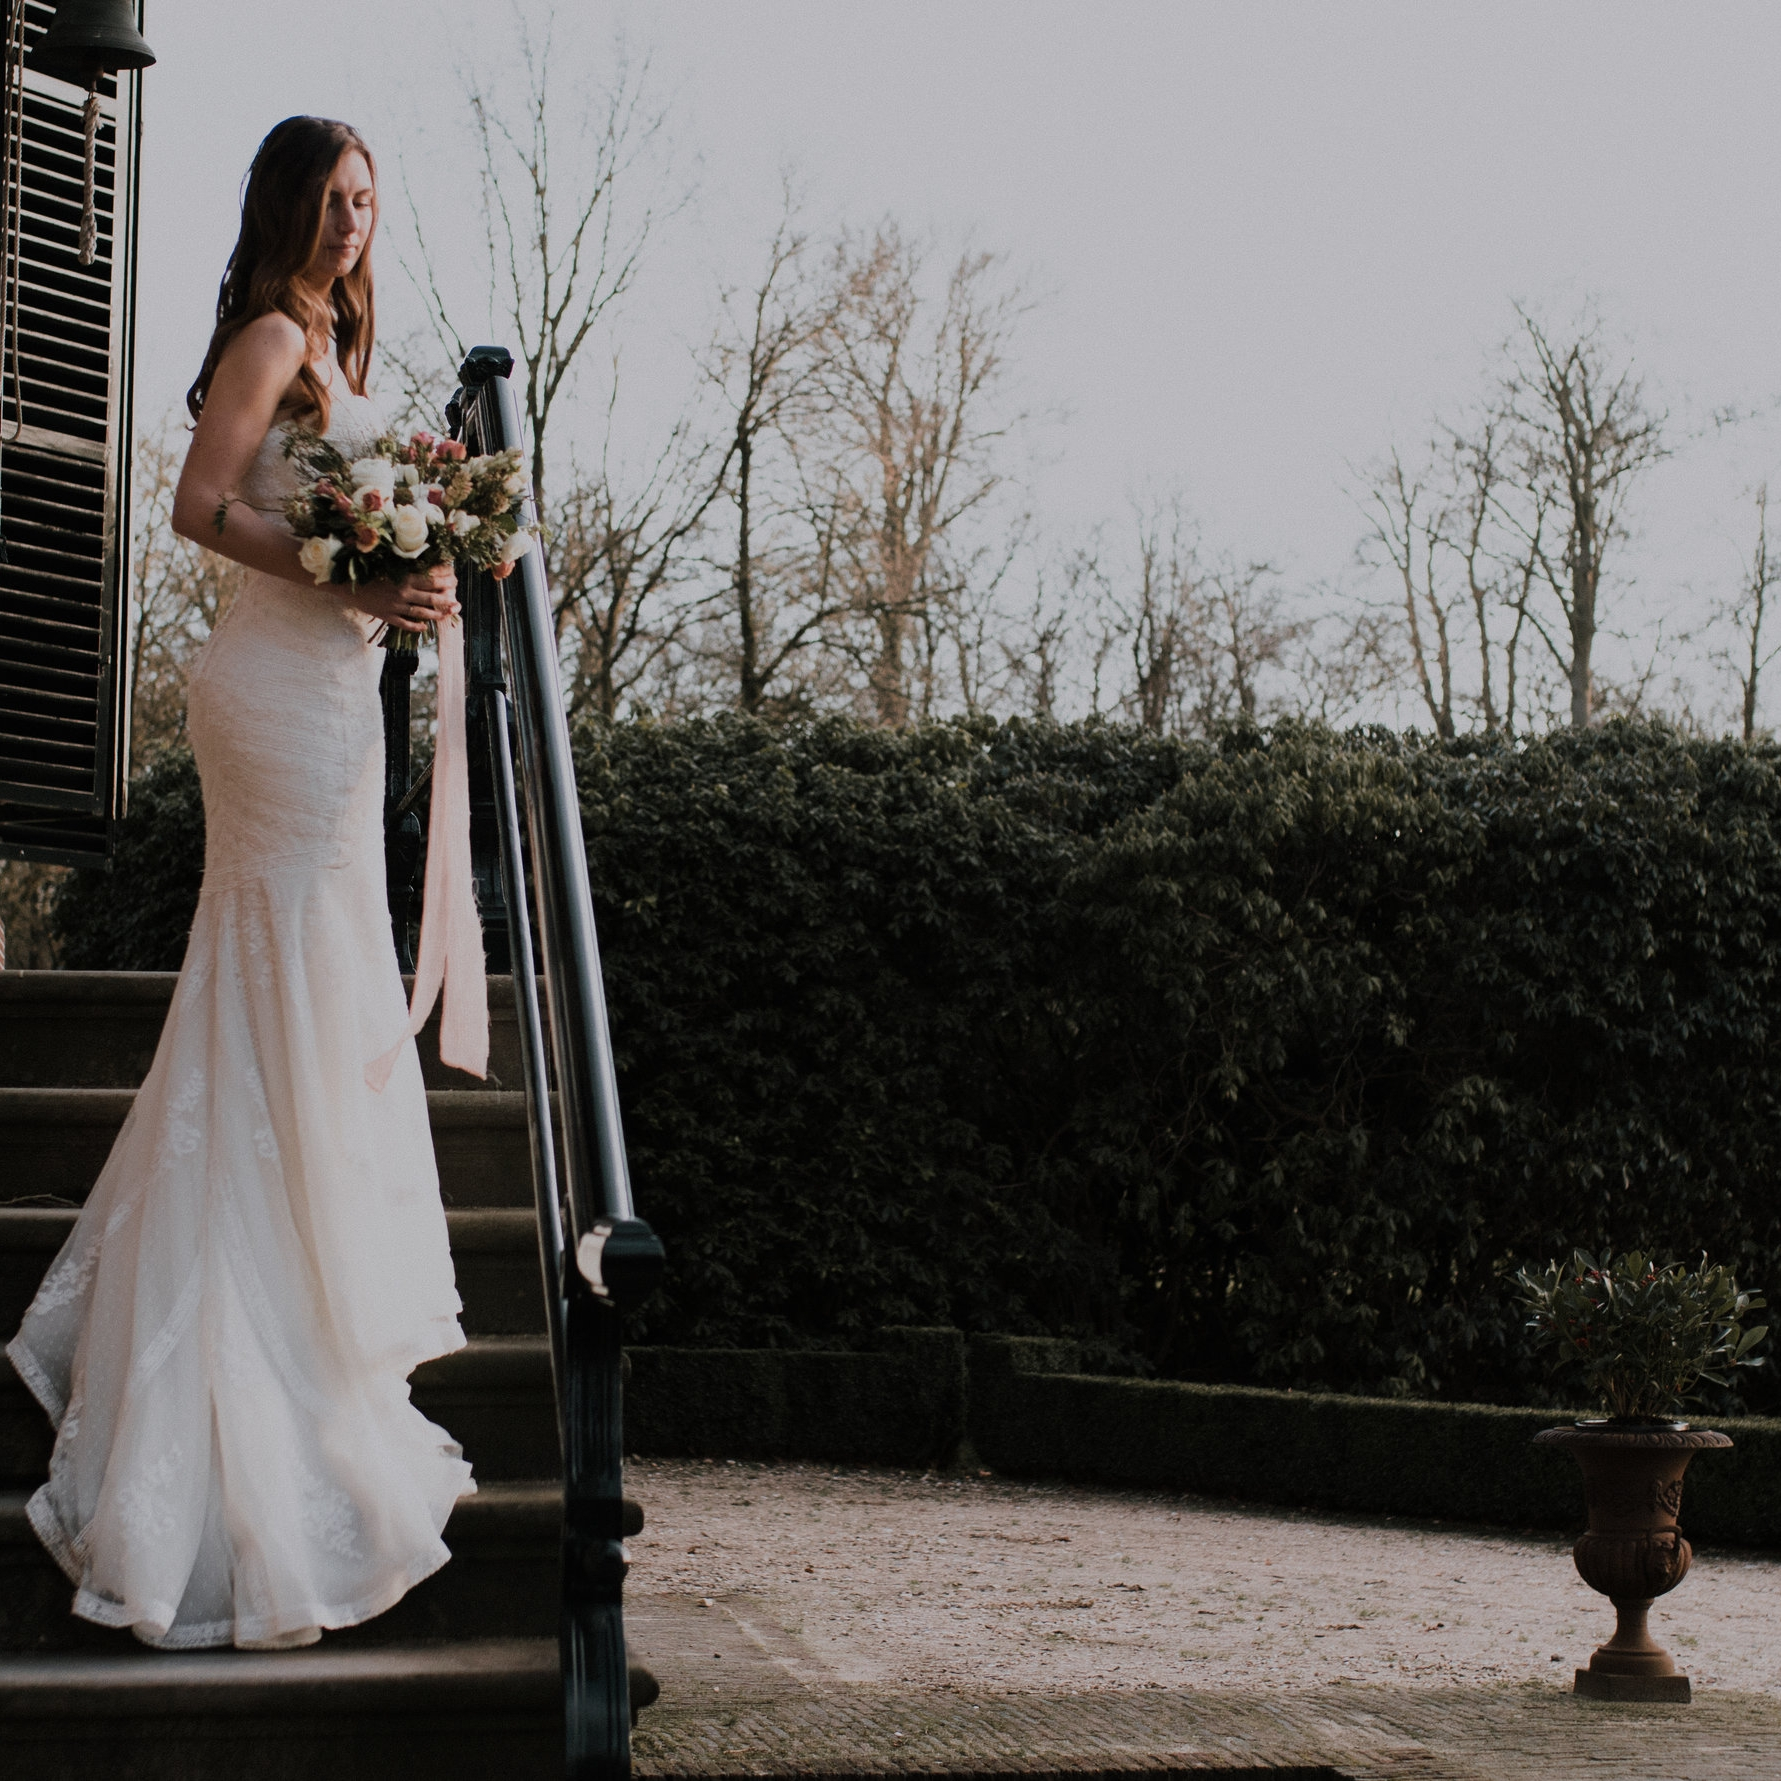 Wedding dress romantic - Daisy & Bird floral design